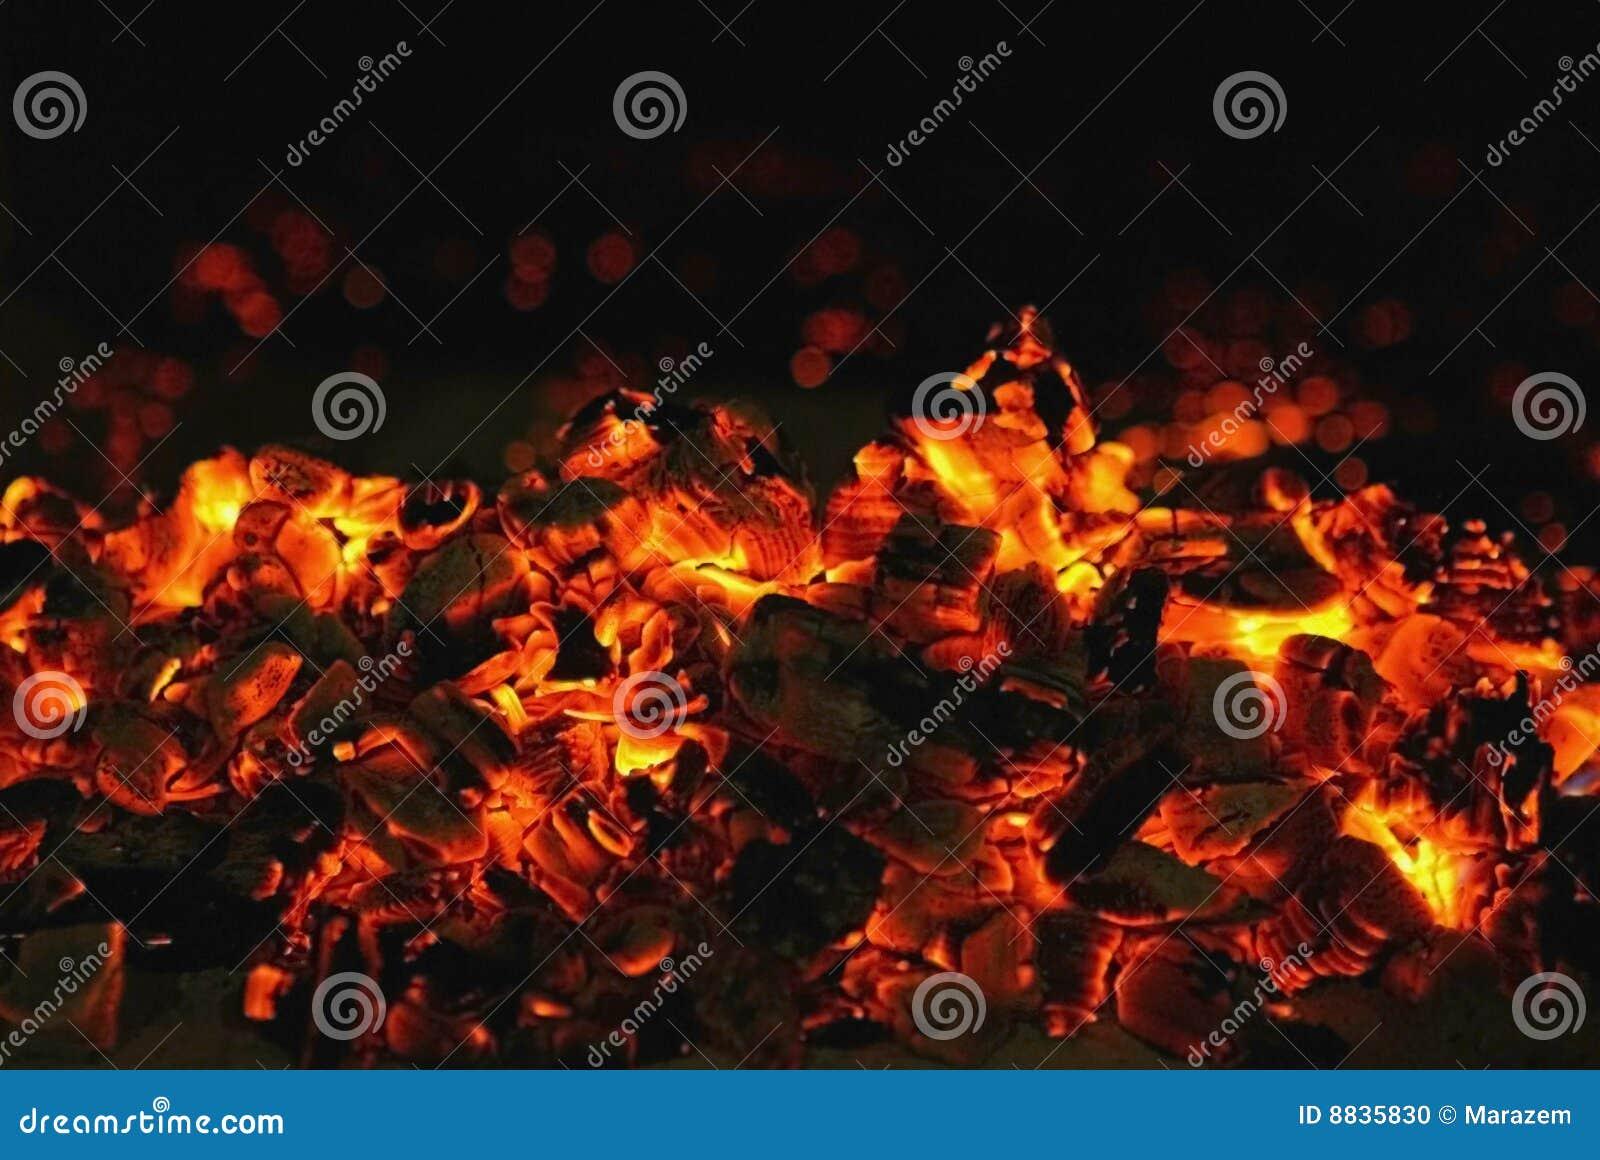 Red coal